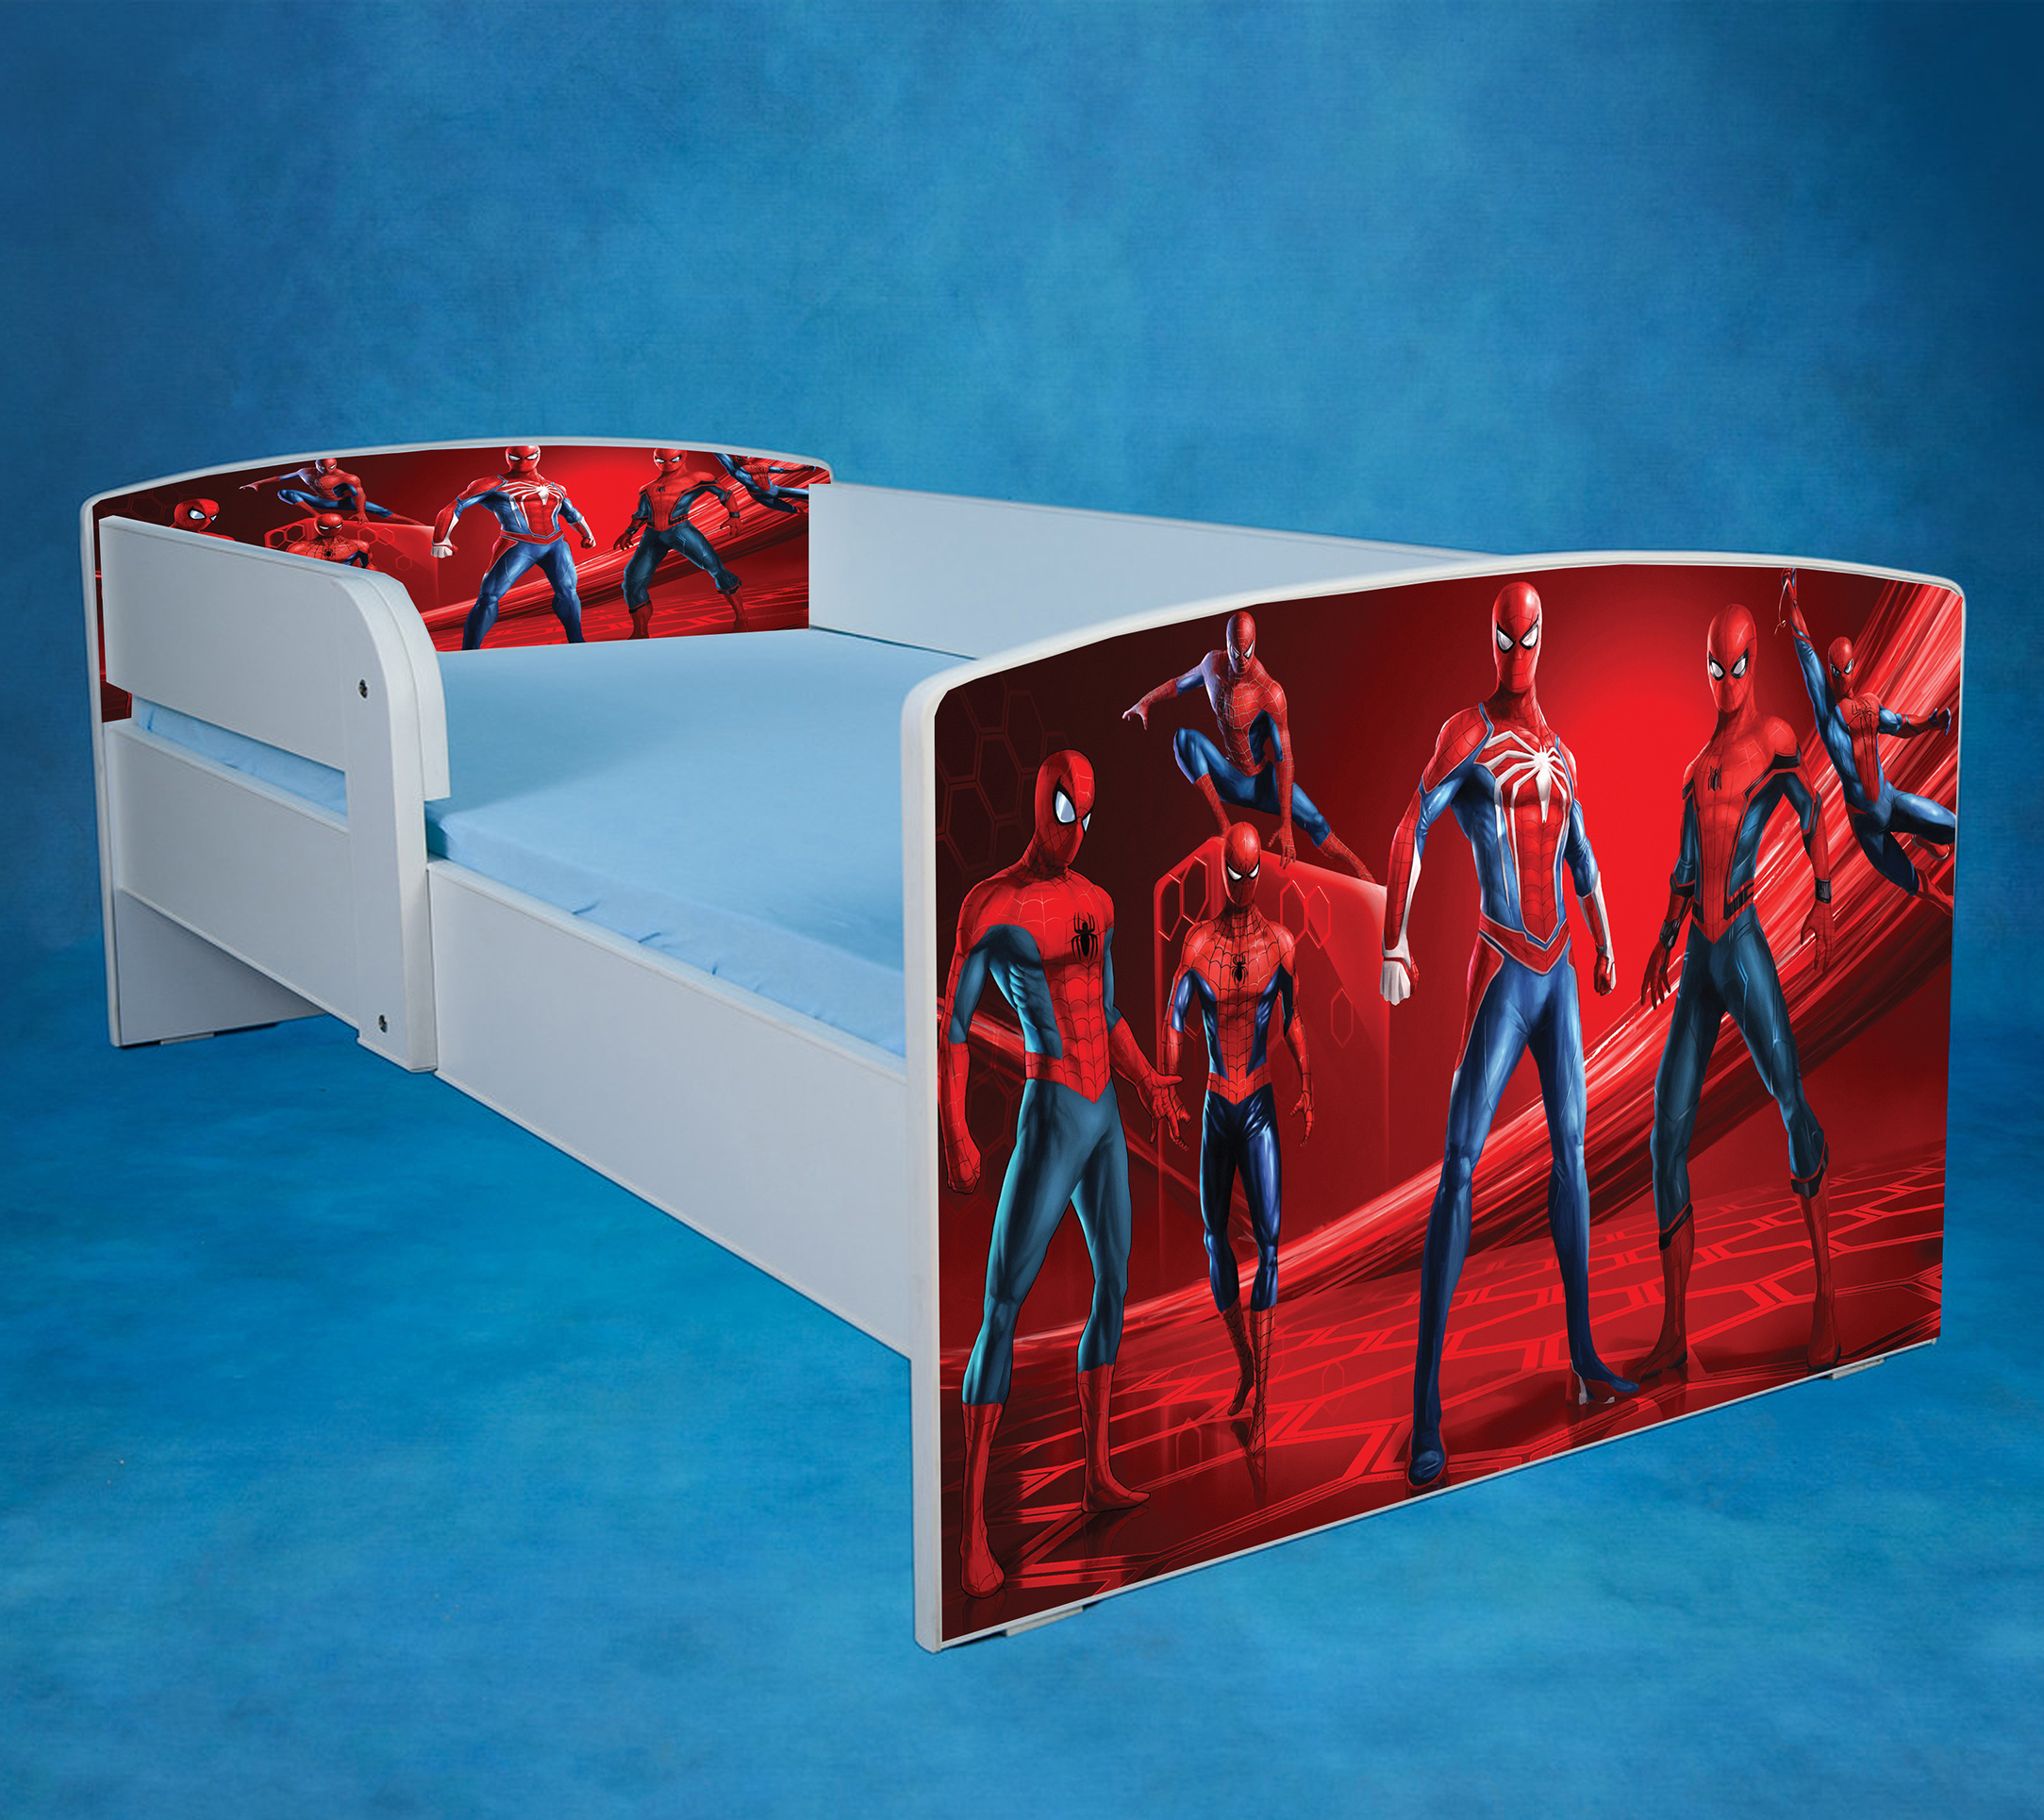 Spider man 3 - saltea inclusa - 160x80 cm (+100 lei), fara sertar